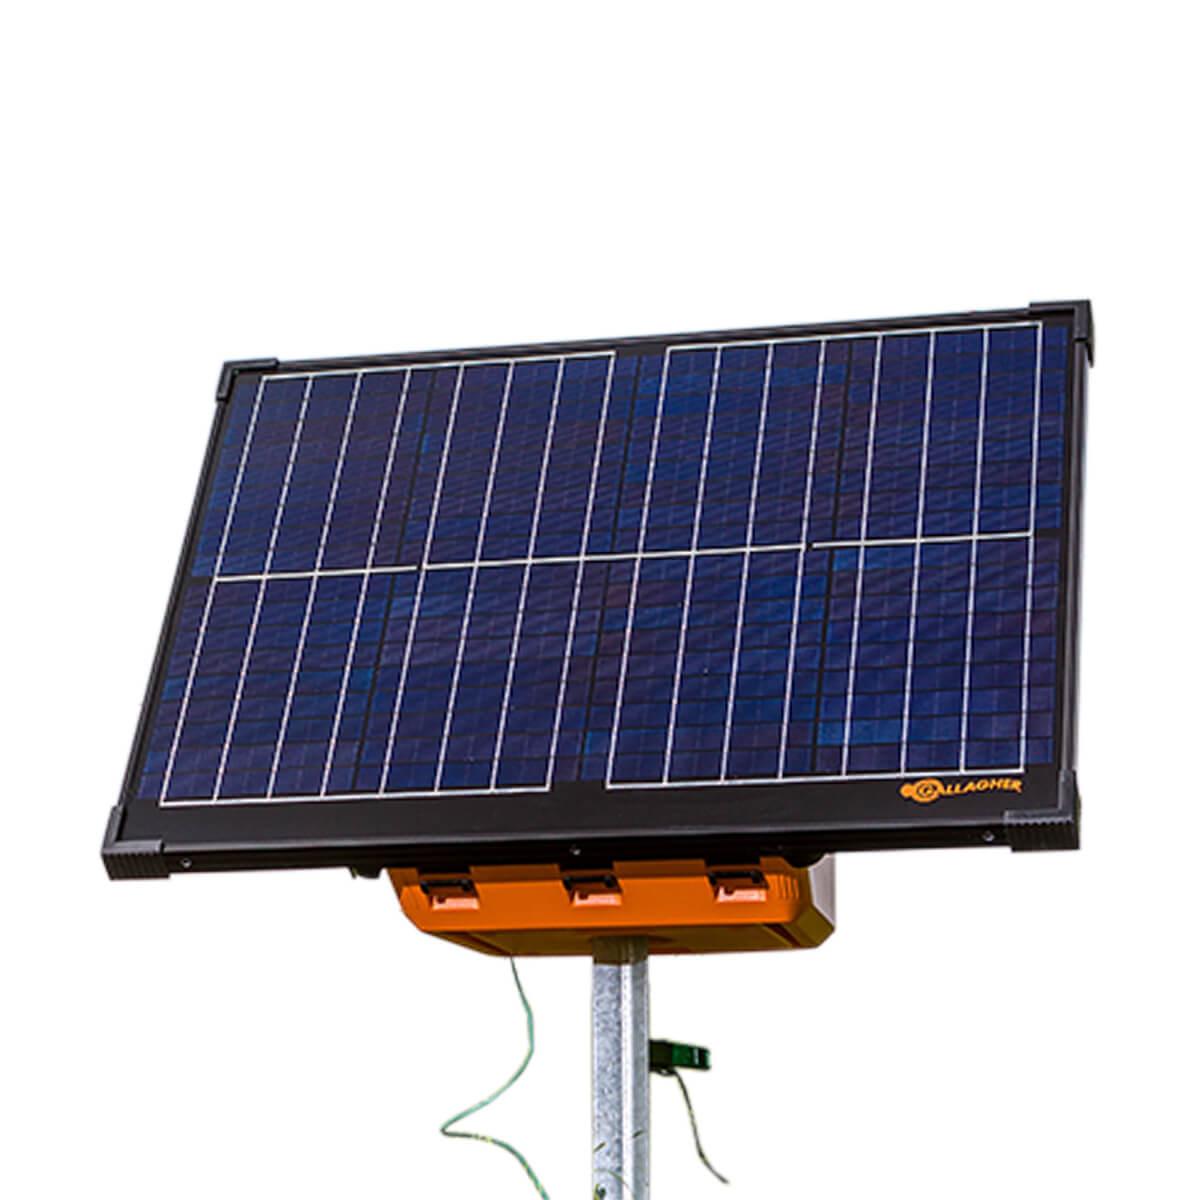 Gallagher - Solar Fence Energizer - S400